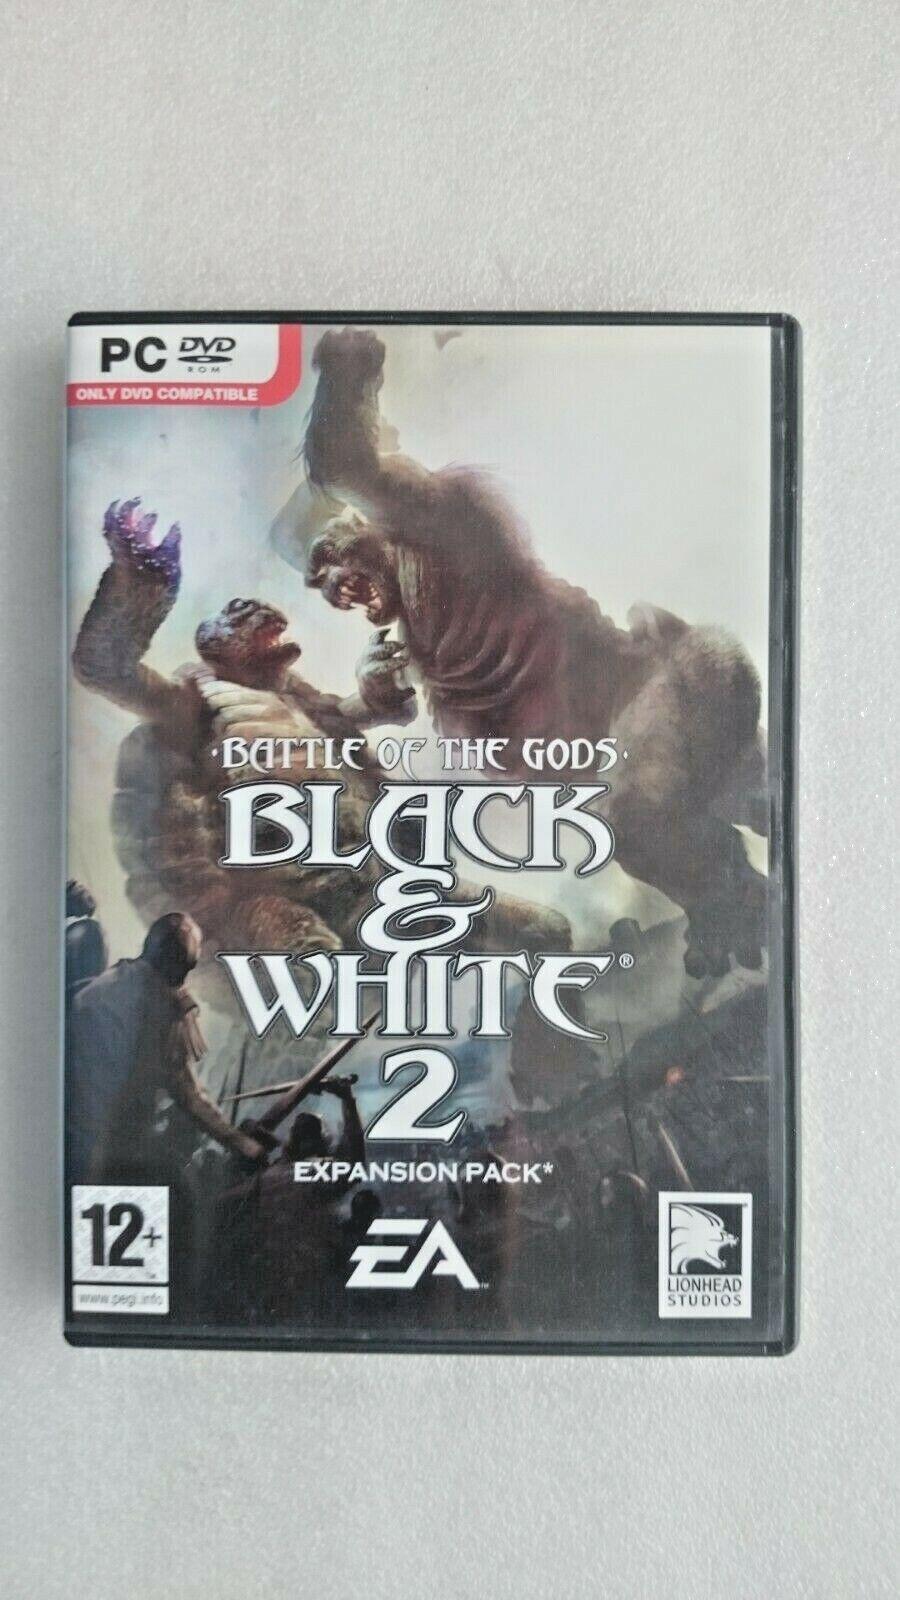 Black & White 2: Battle of the Gods Expansion Pack  (PC: Windows, 2006)